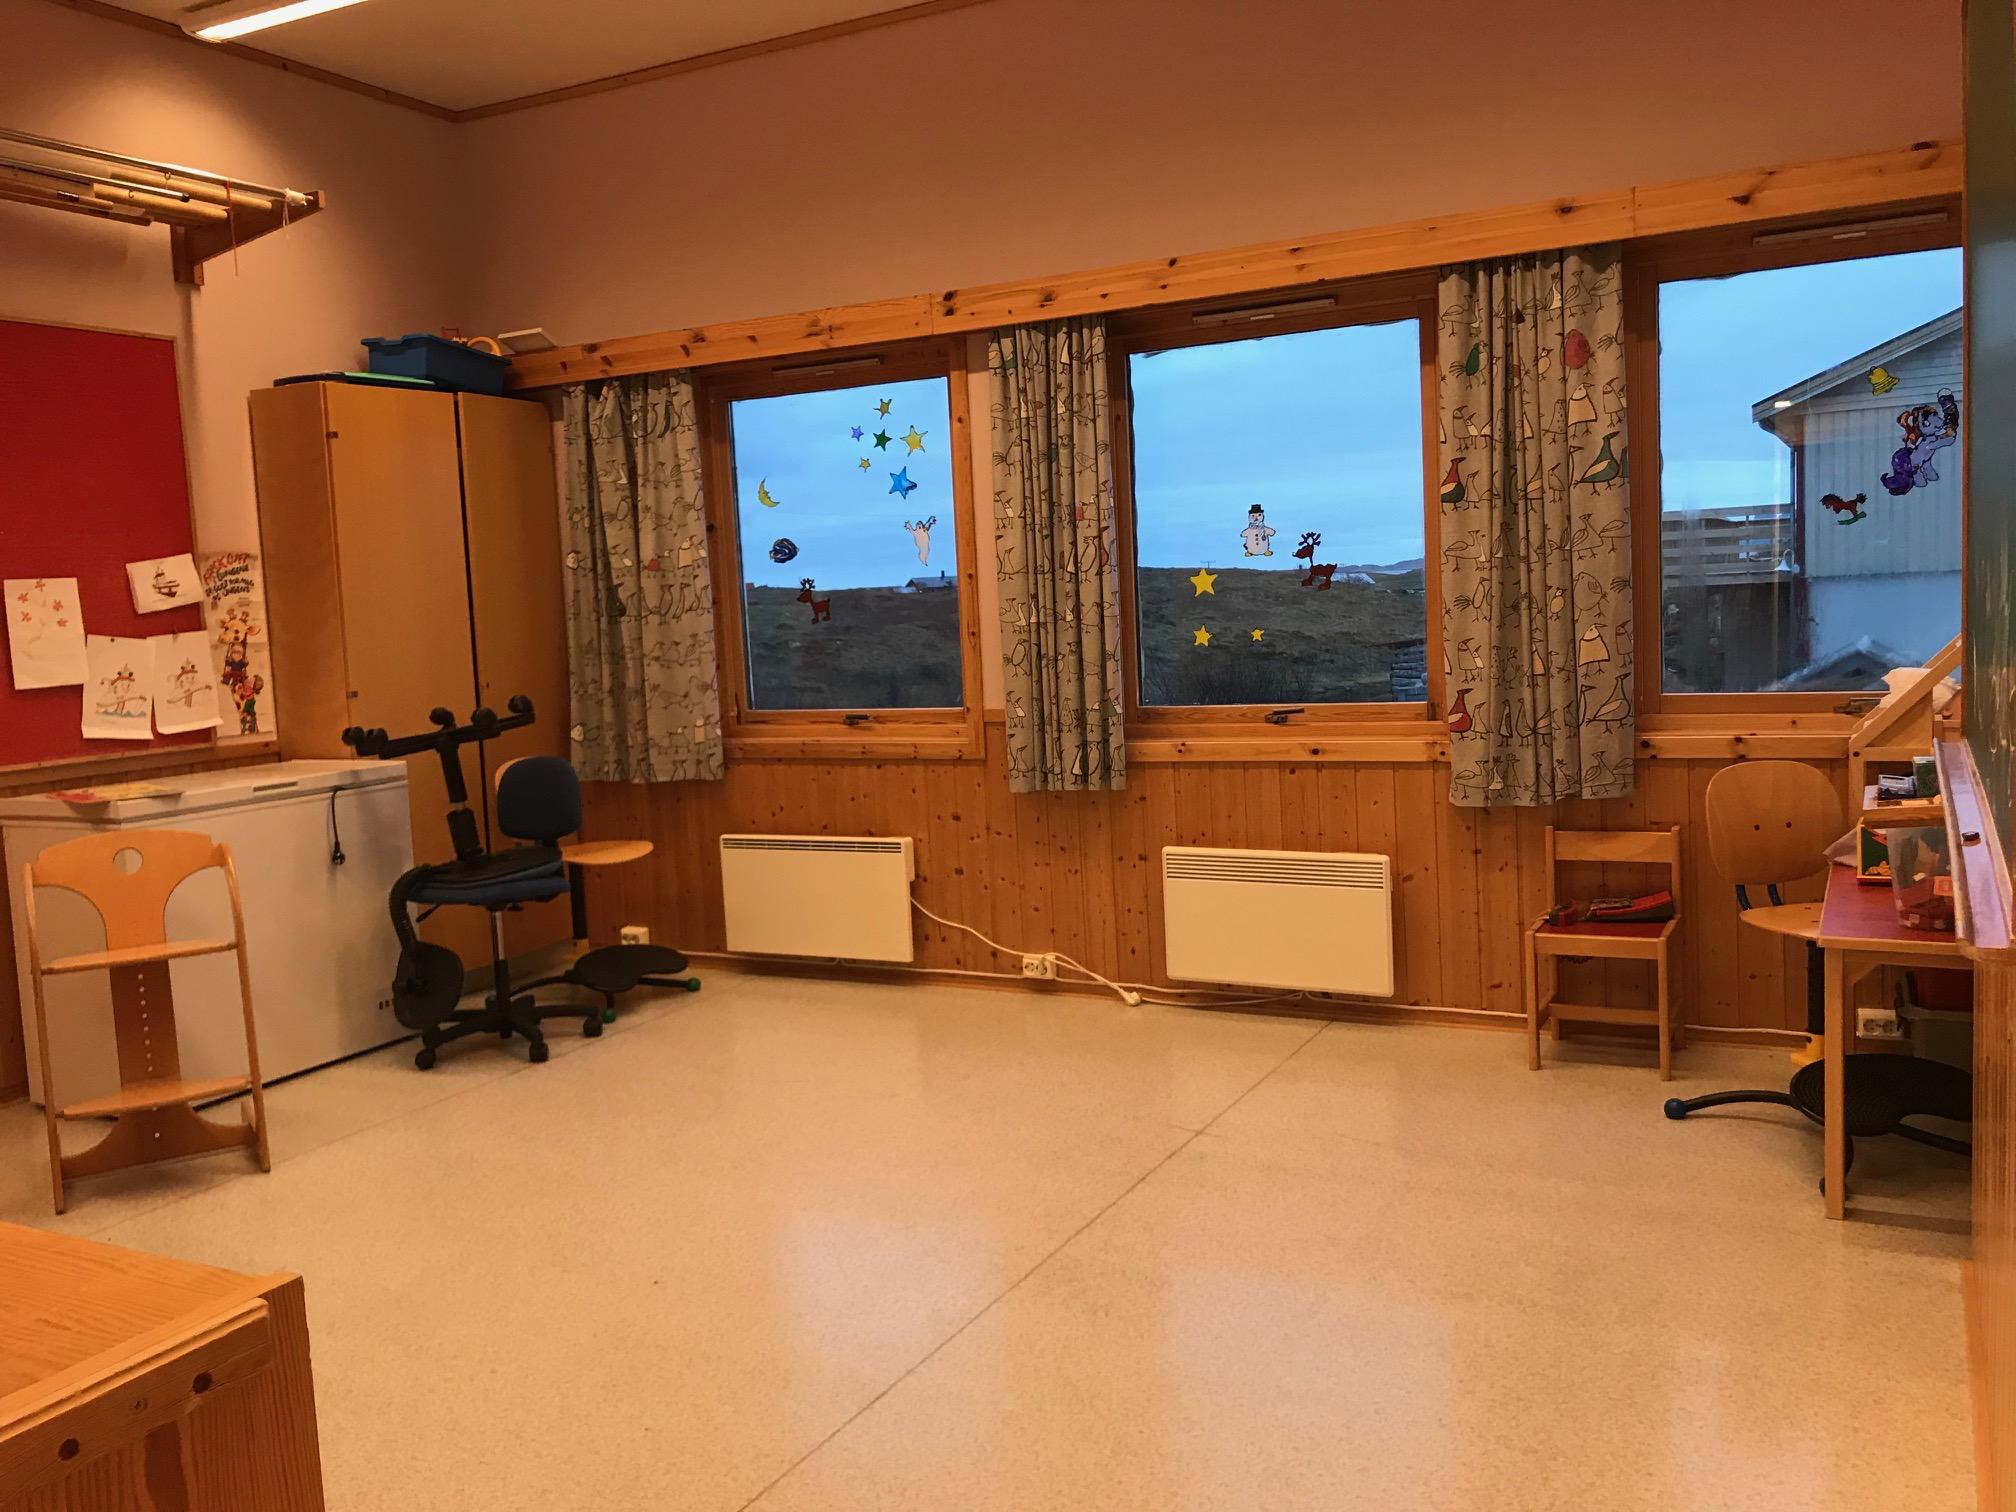 Det minste klasserommet er på 20 kvm. Her er det også en bred stålvask med varmt- og kaldtvann.